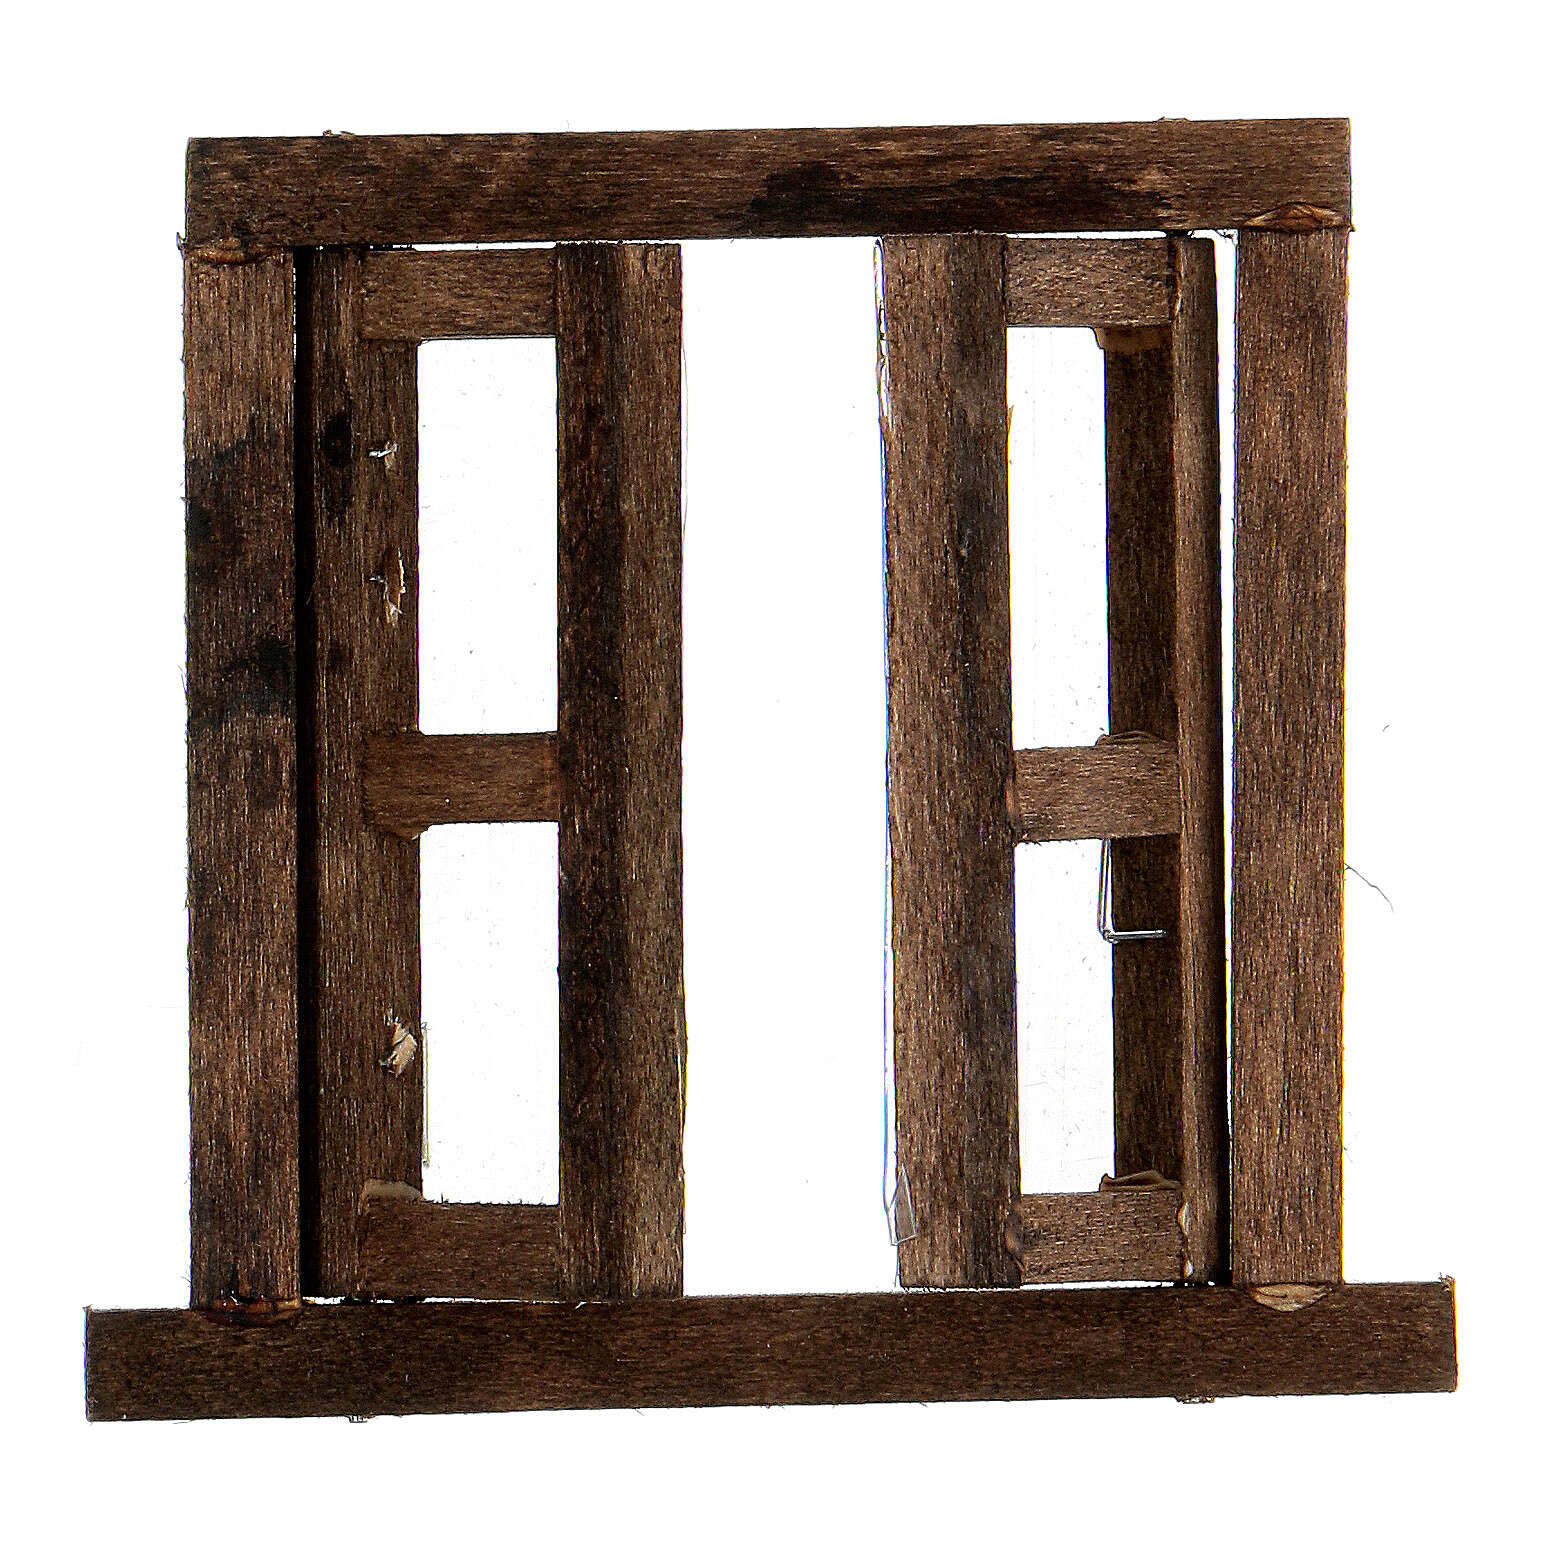 Nativity accessory, window, 2 doors with frame 6.5x6.5cm 4